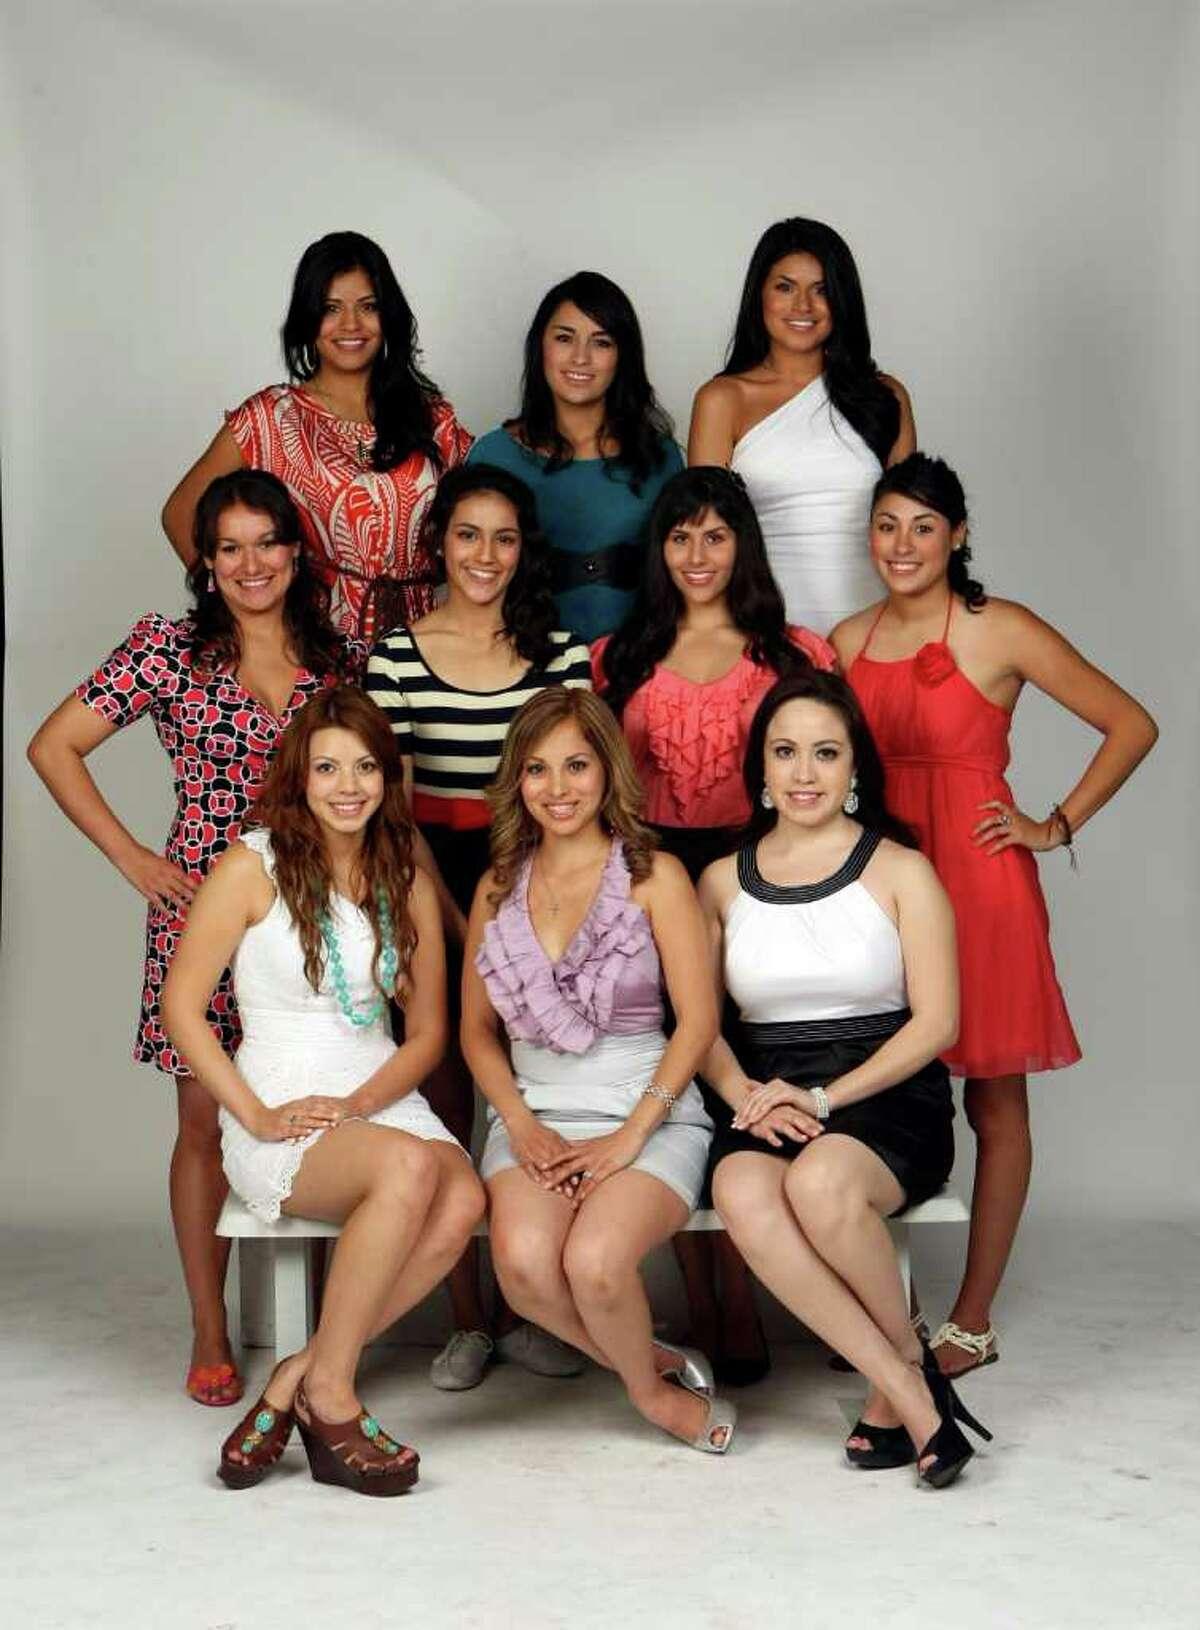 CONEXION: 2011 Top 10 Hottest Latina contestants. Photographed Sunday April 10, 2011 HELEN L. MONTOYA/hmontoya@express-news.net